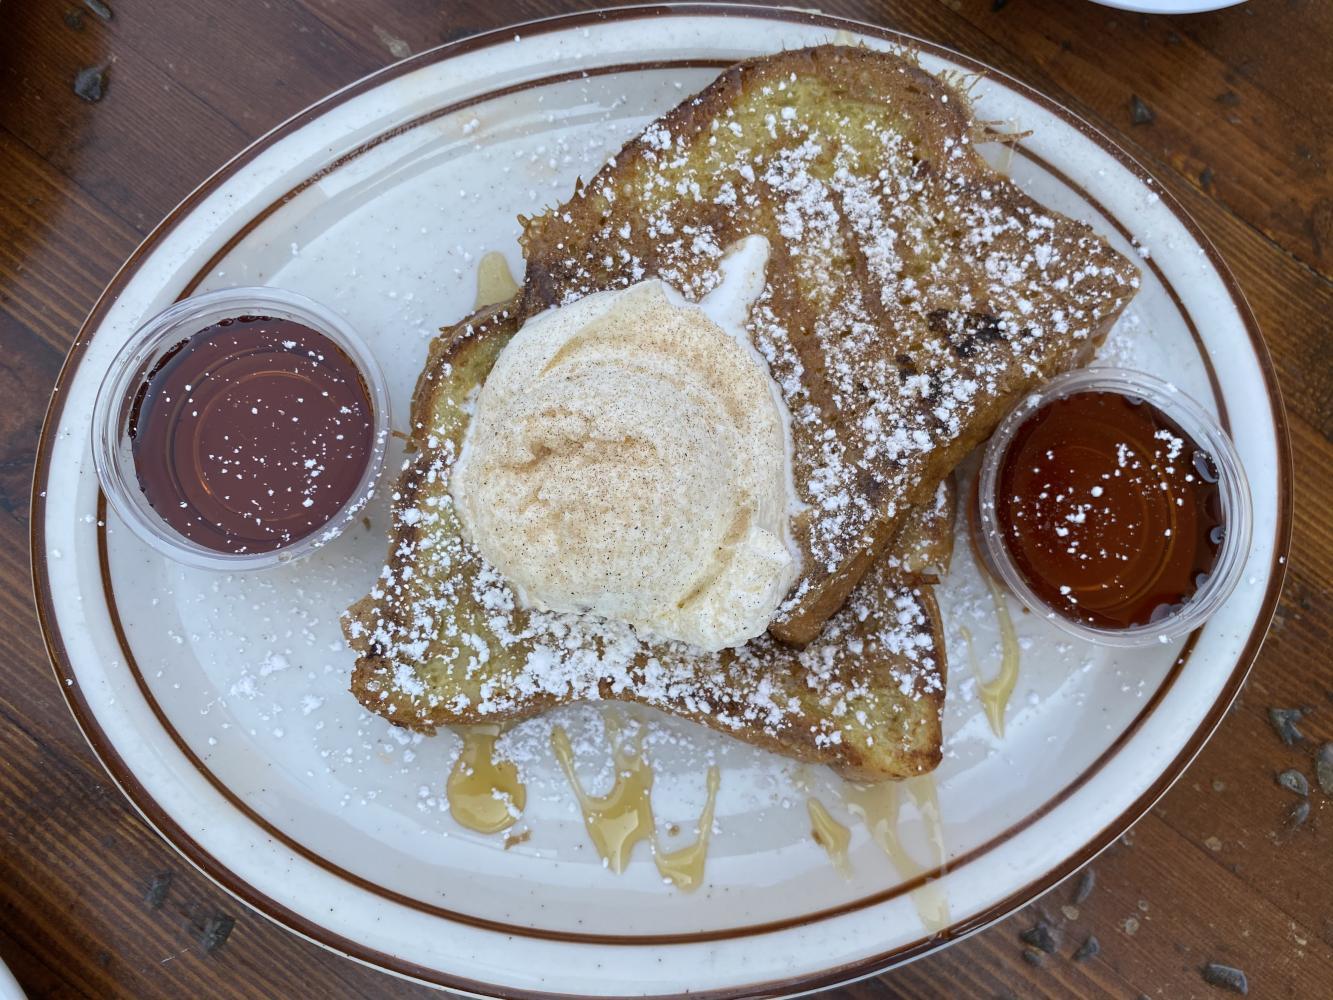 Honey French Toast ($8.50)